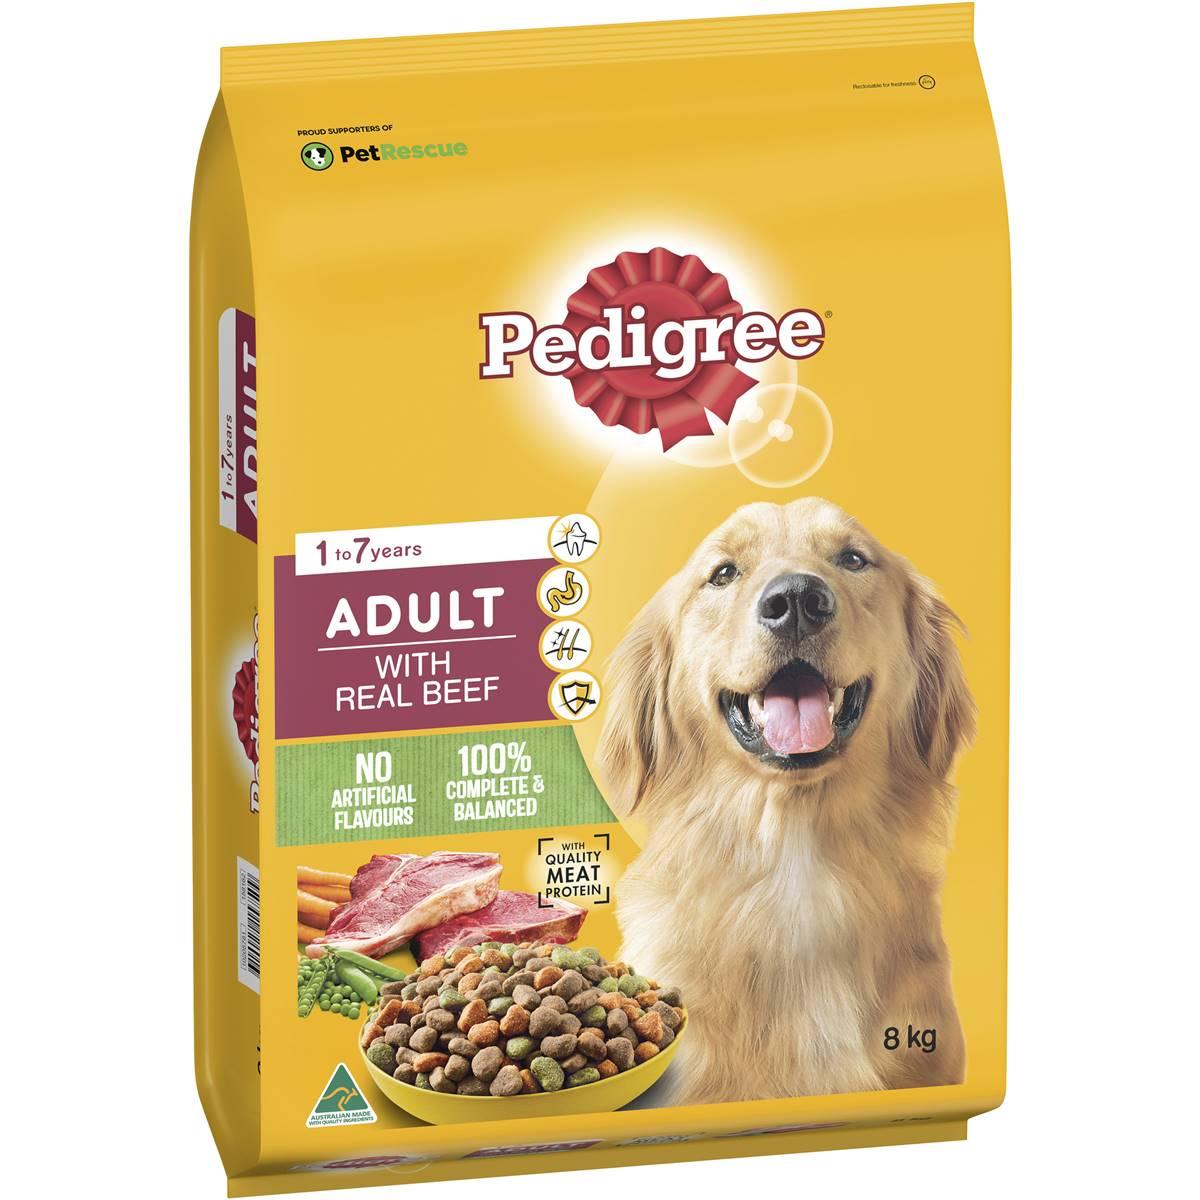 Pedigree Add Dog Name